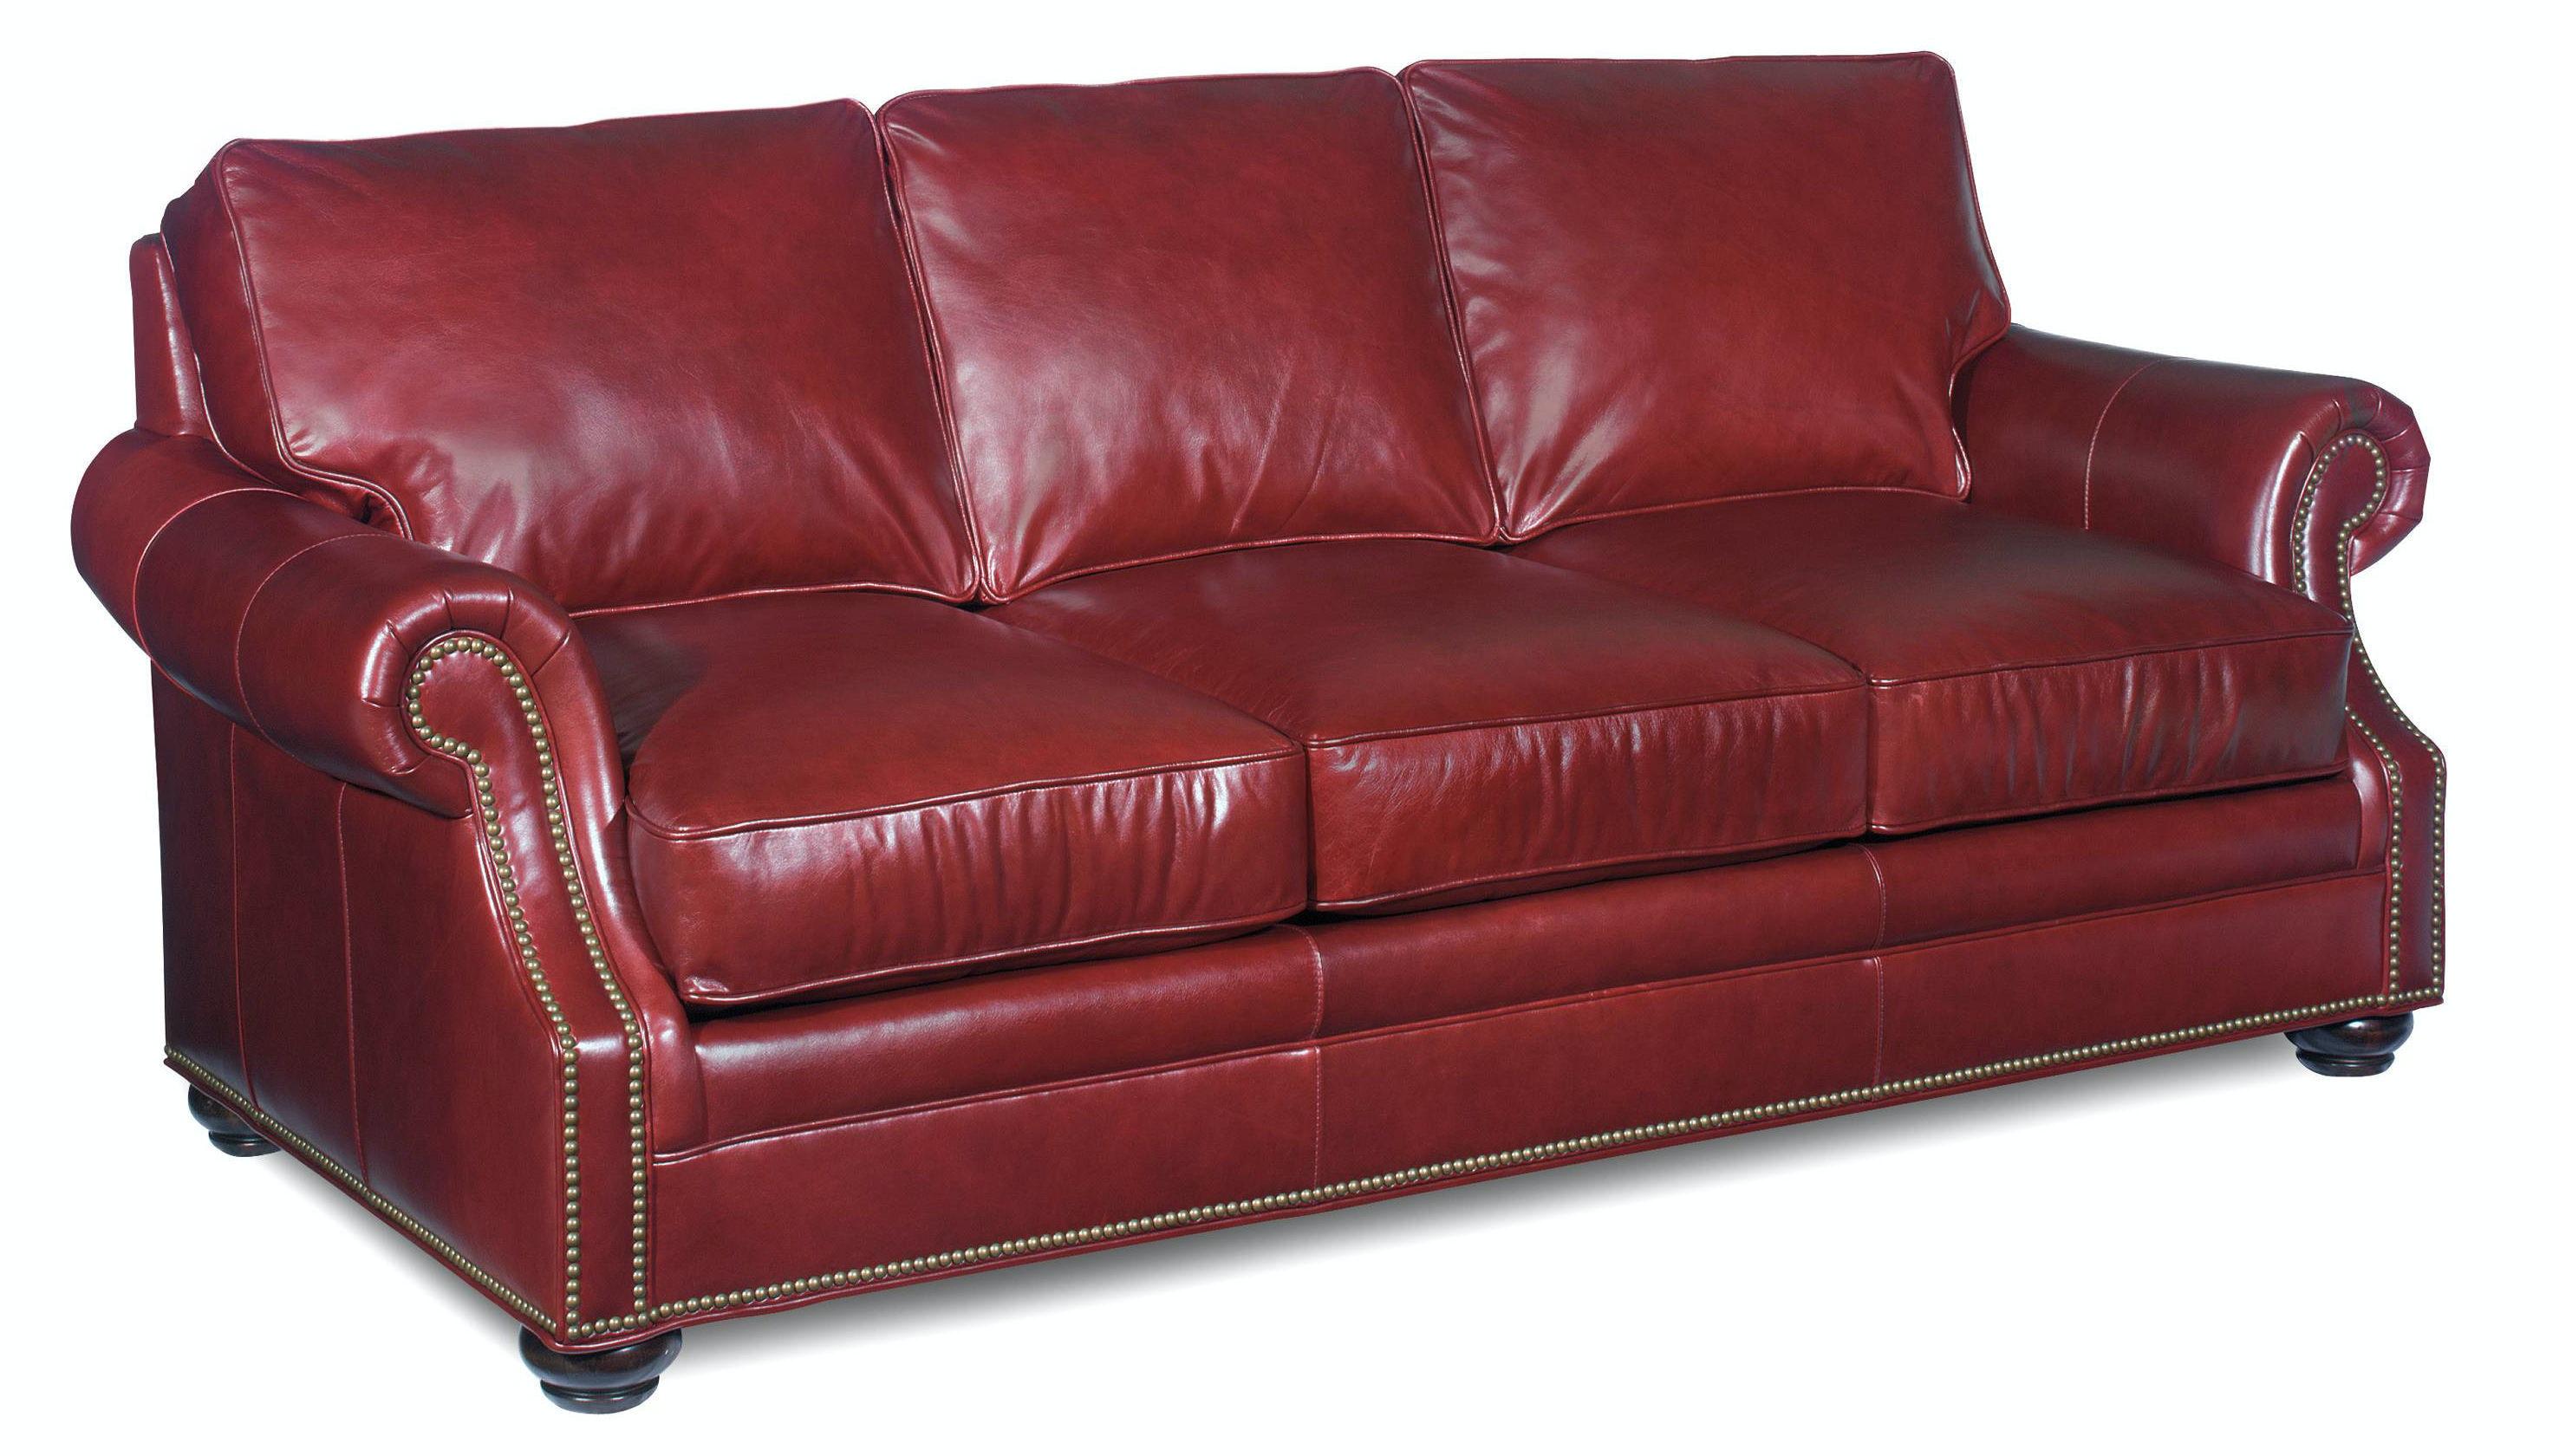 Bradington Young Warner Stationary Sofa 8 Way Tie 220 95